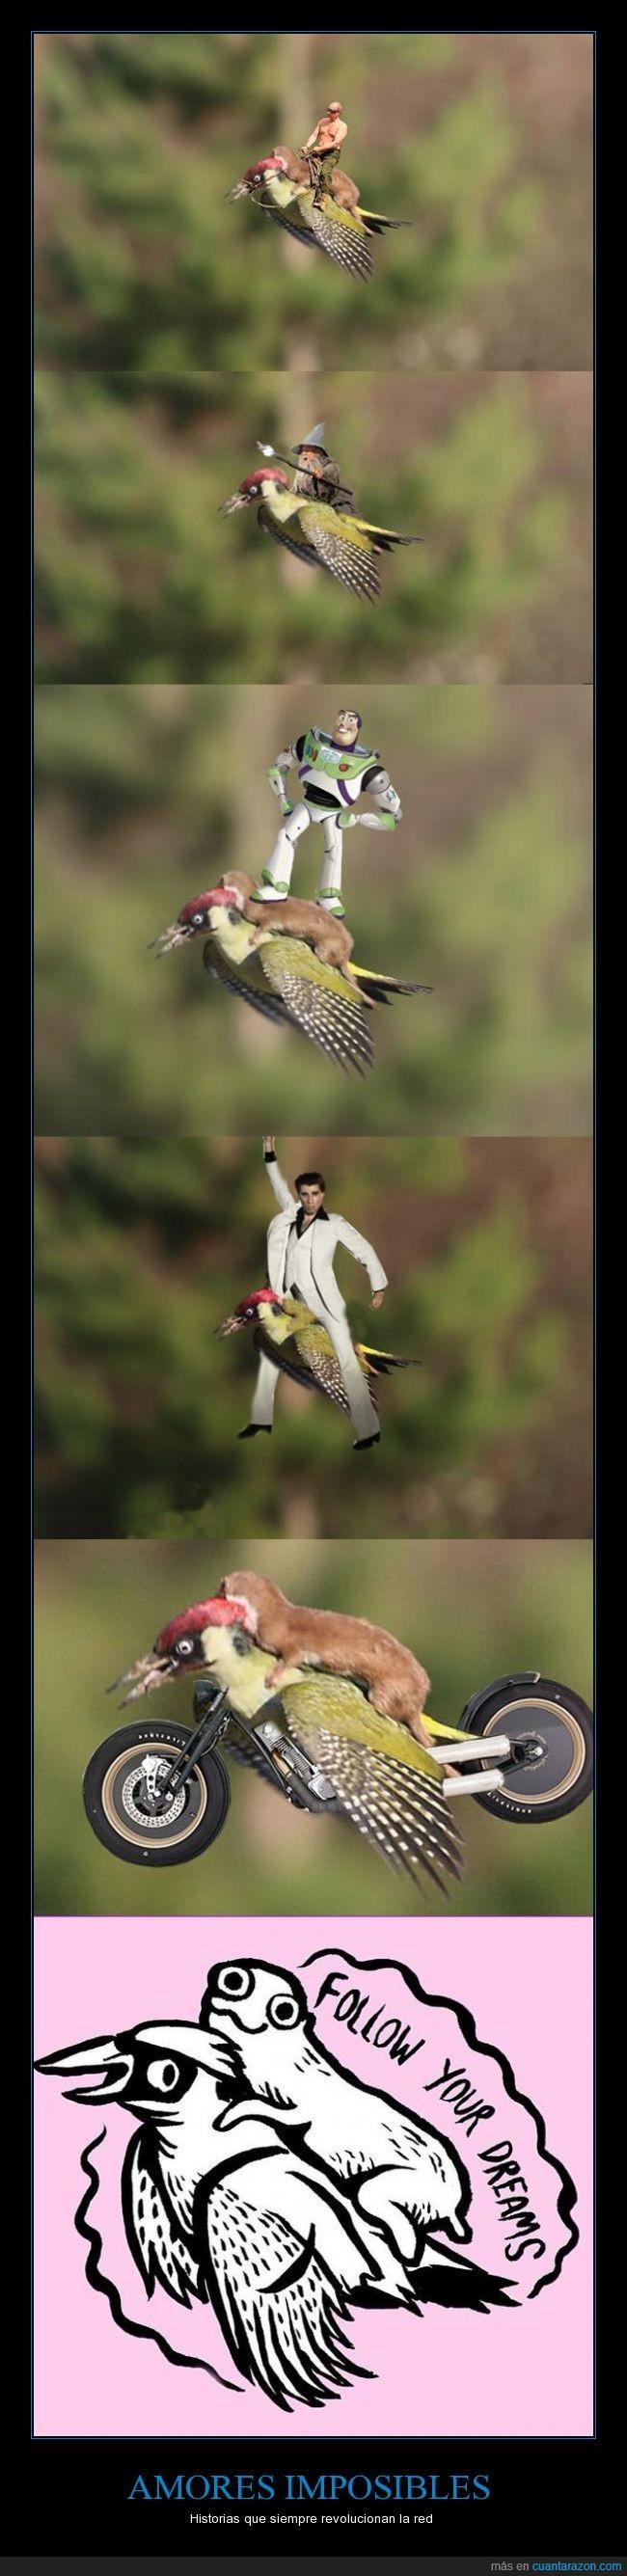 animales,chops,comadreja,curioso,divertido,humor,internet,meme,montaje,pájaro